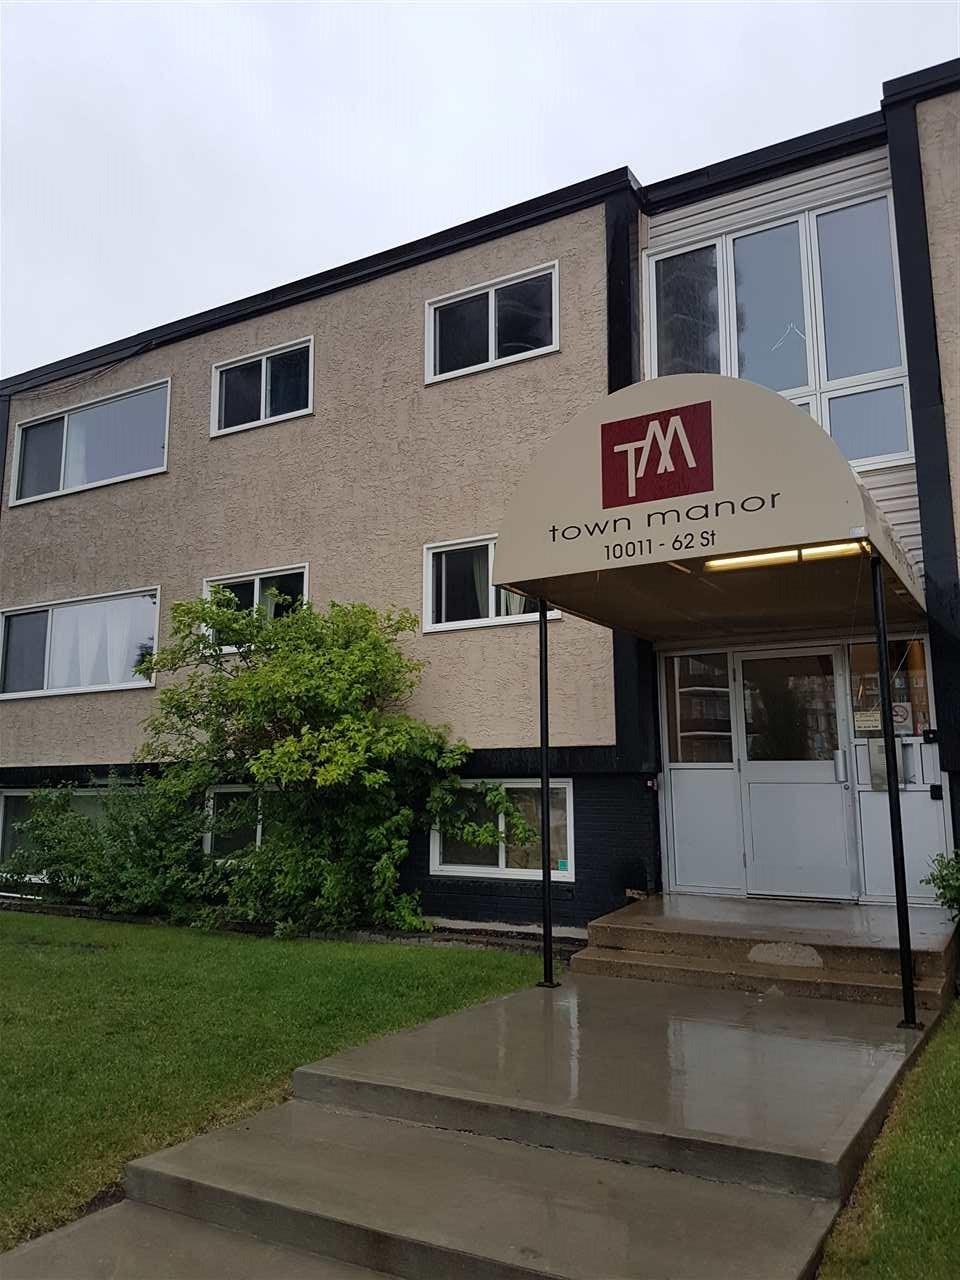 Ml e4071762 private address terrace heights edmonton for Terrace address